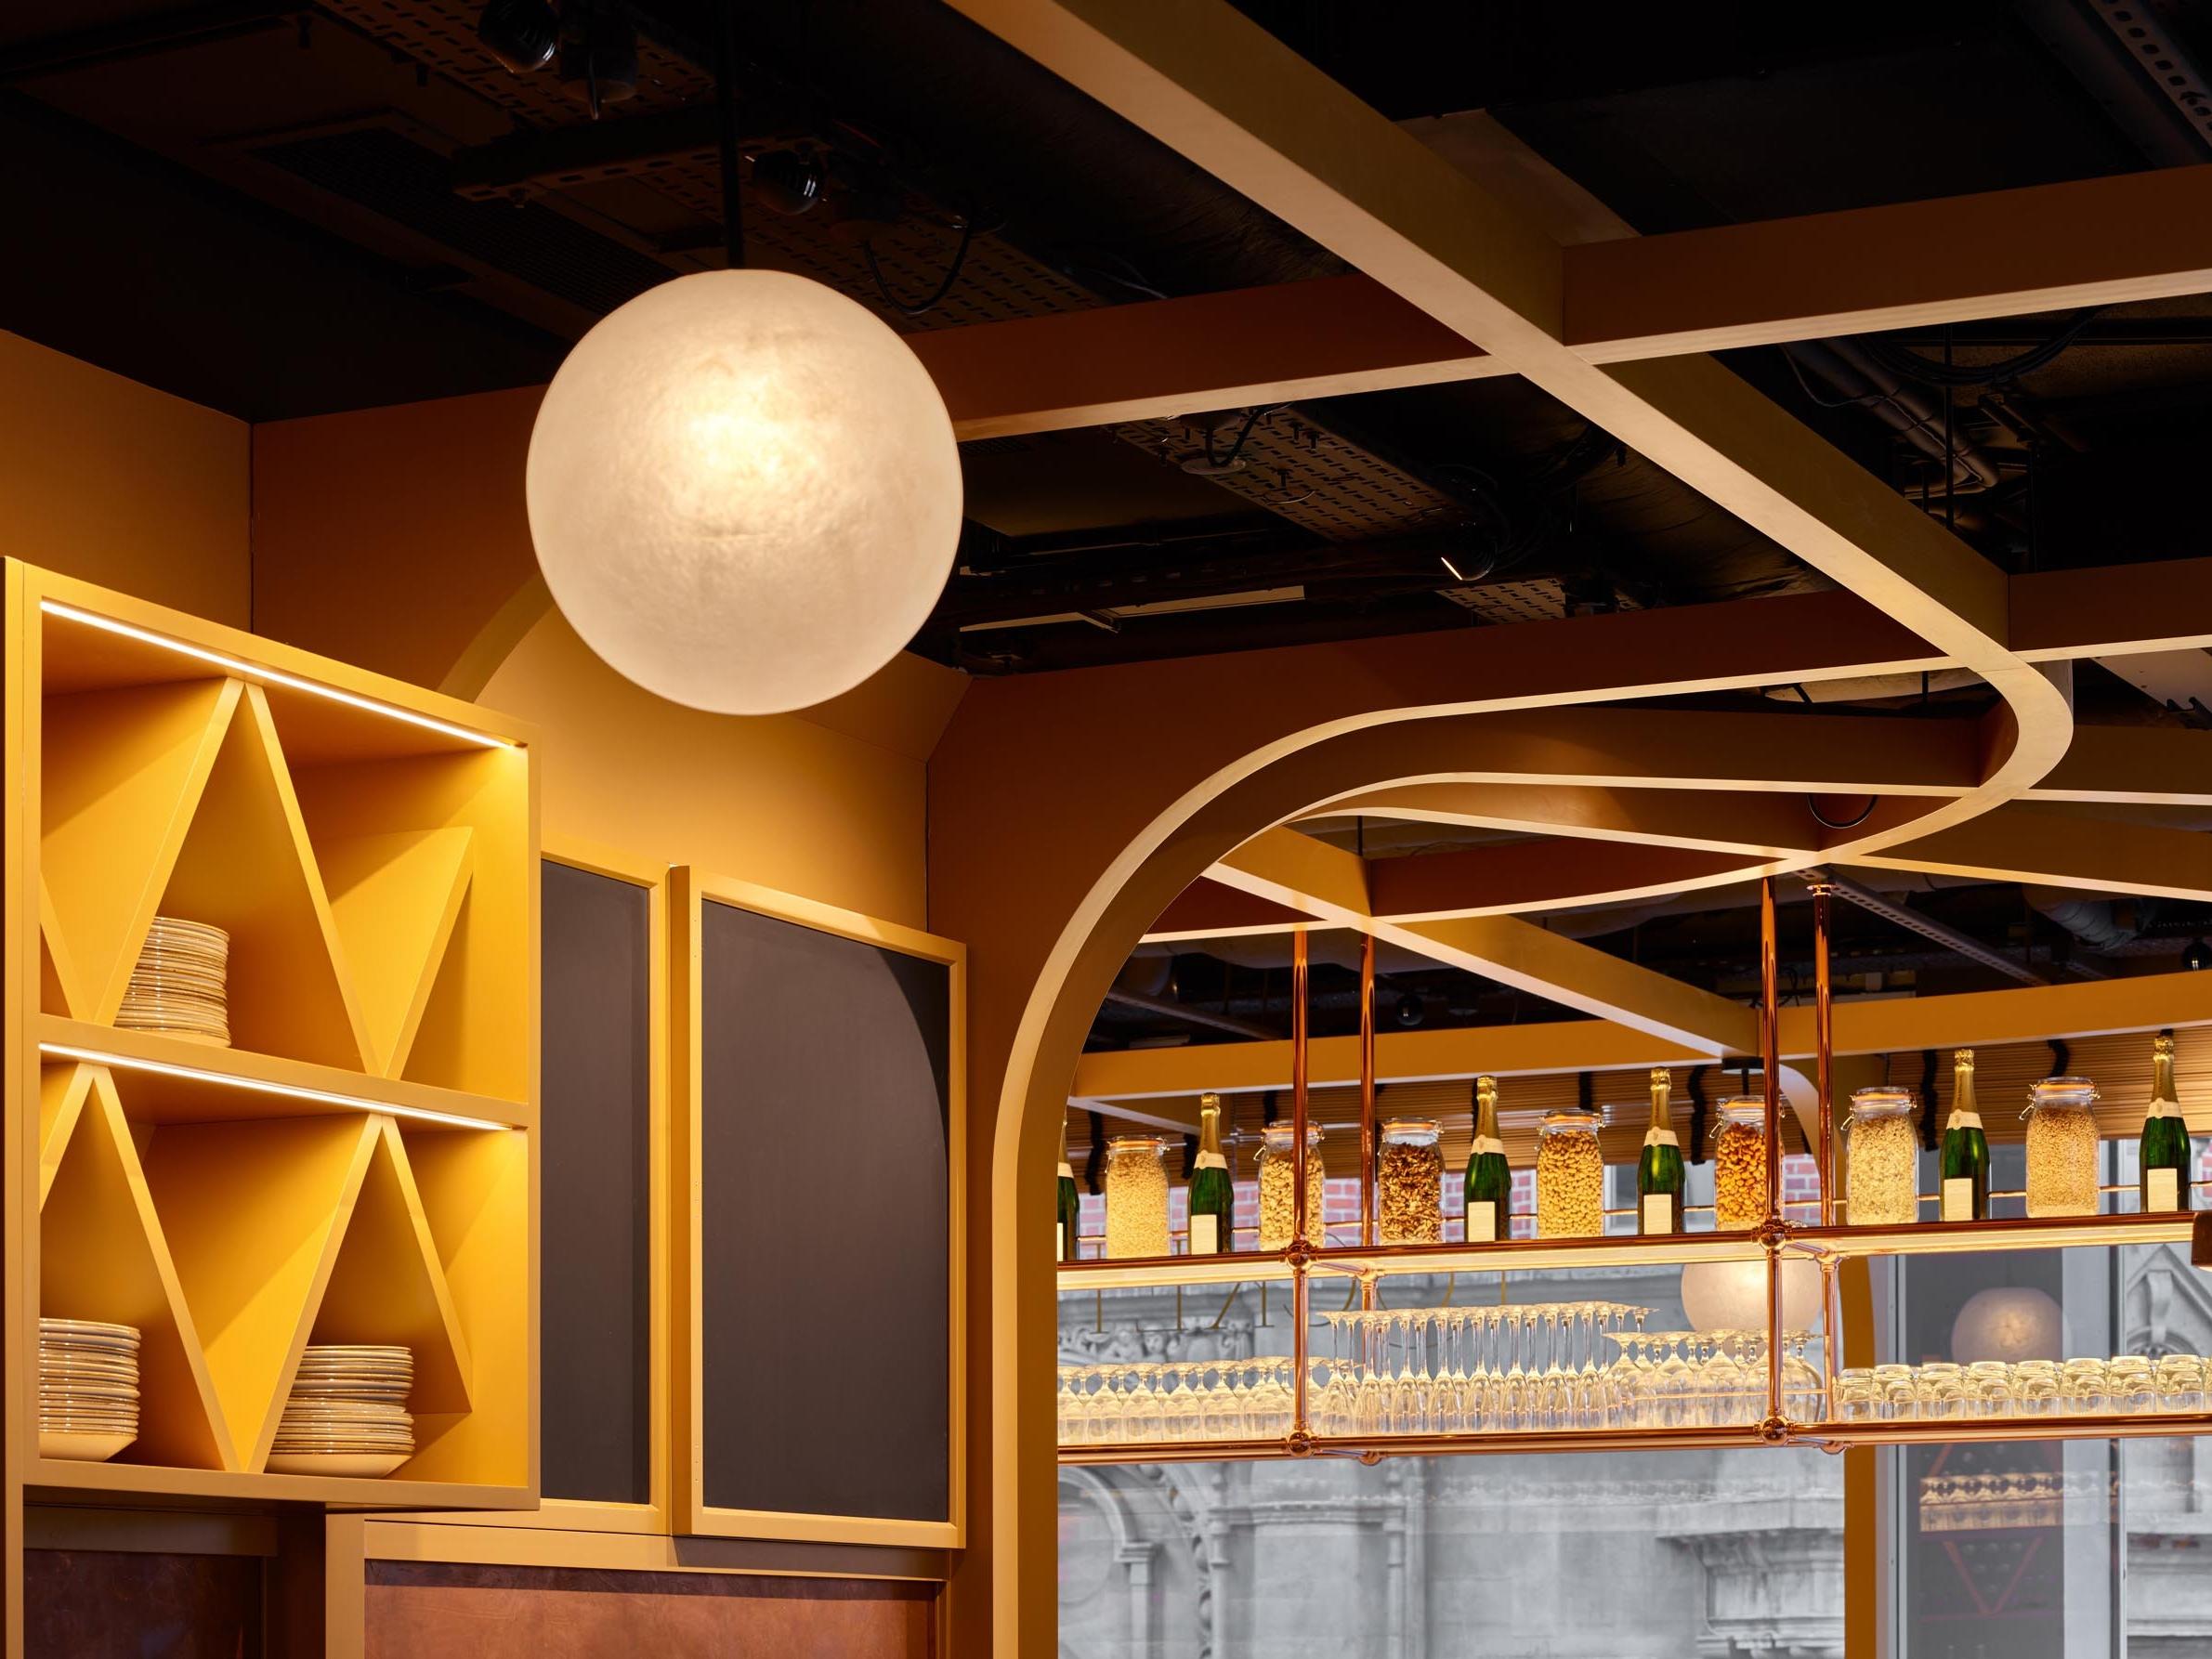 Ceiling - Locket's - RYE Design